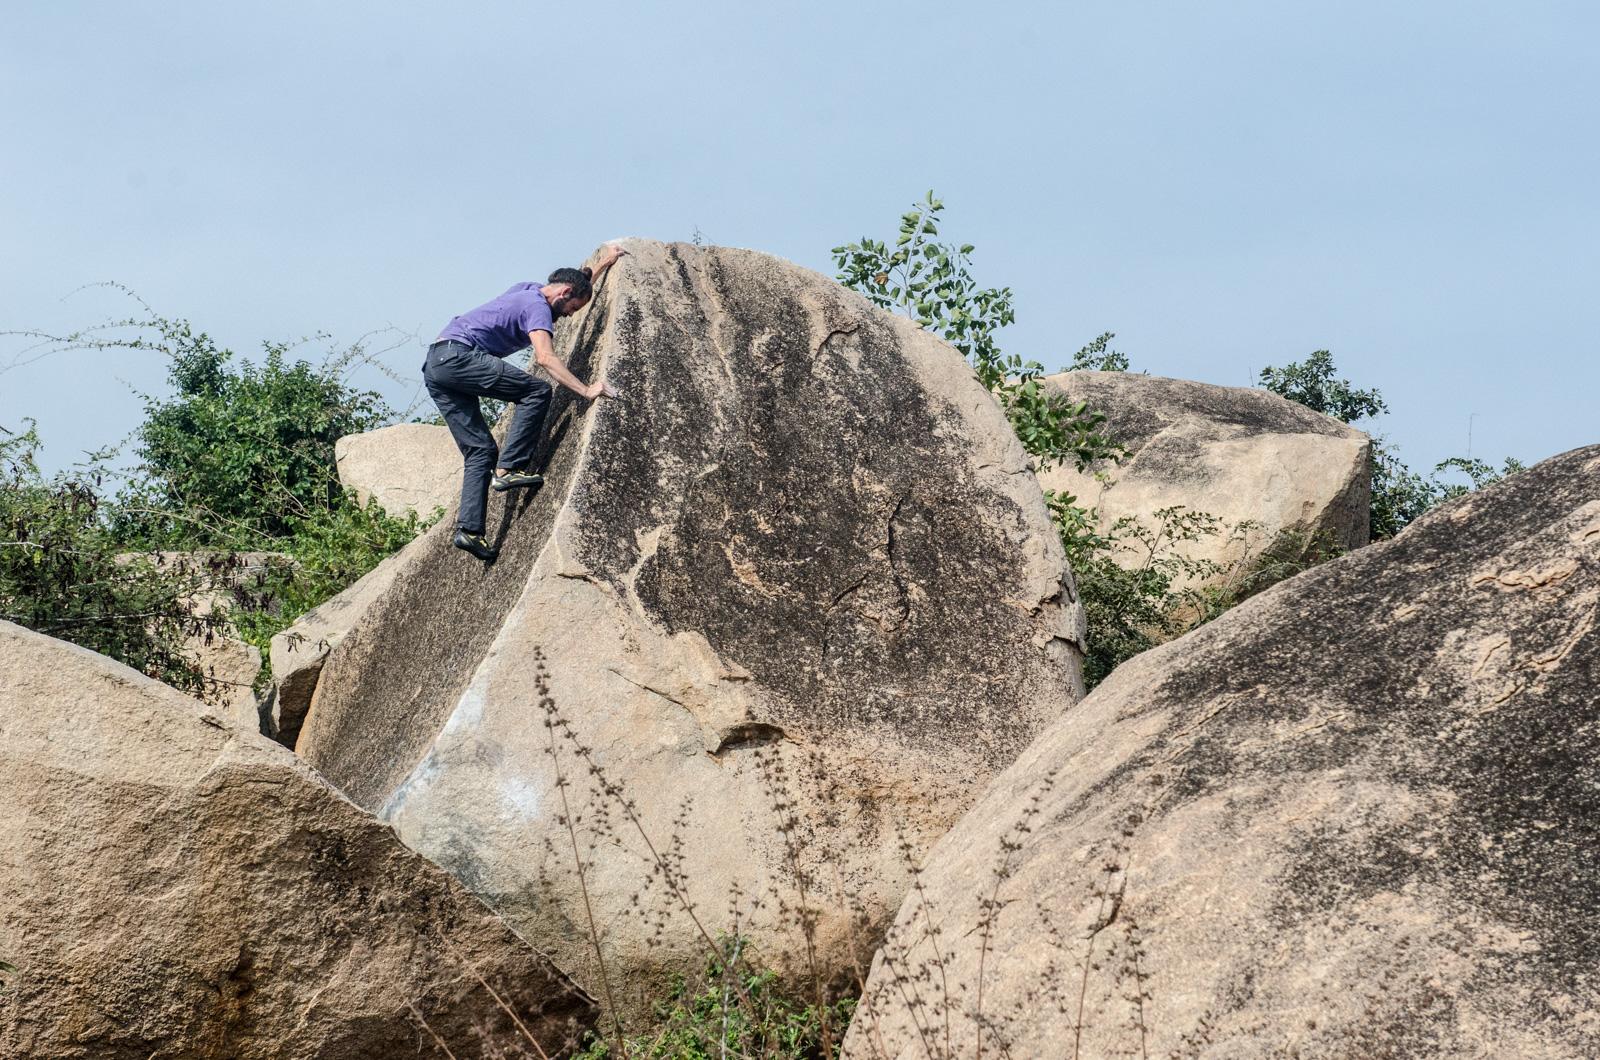 Hampi-India-bouldering-rockclimbing-AmyRolloPhoto-0969.jpg